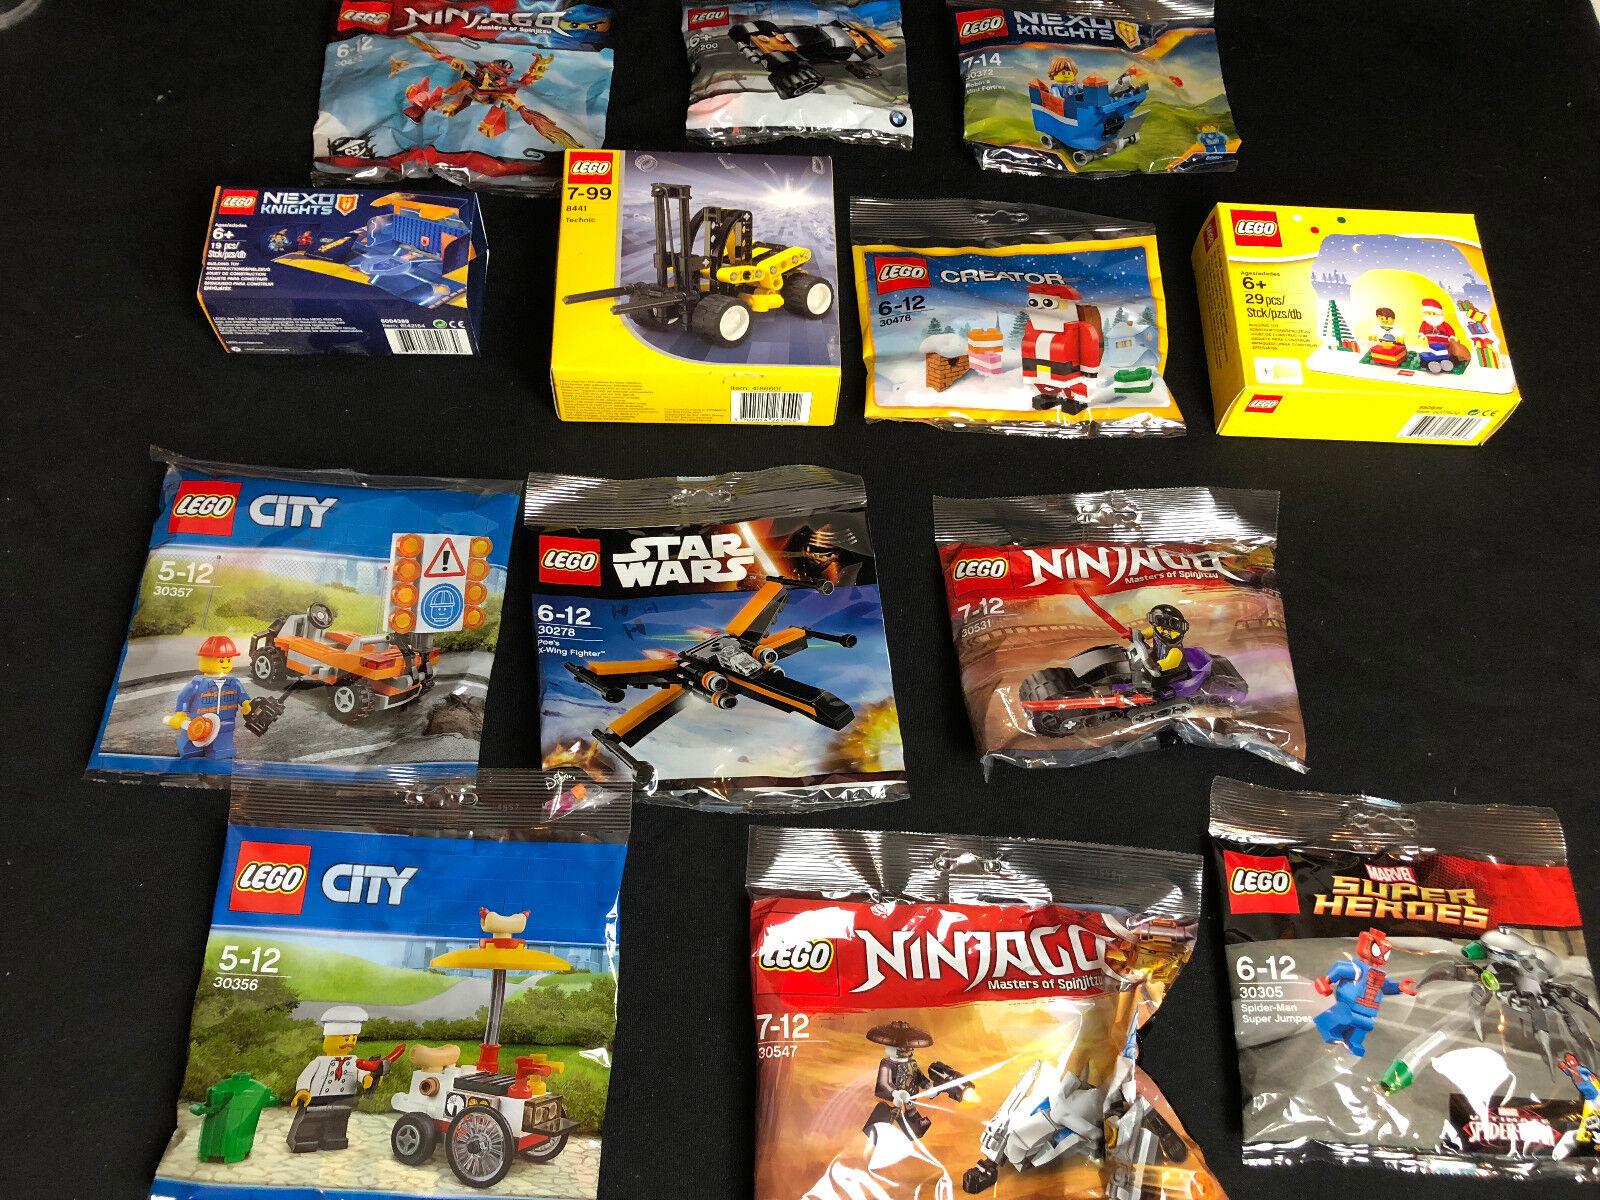 Lego 13 ENSEMBLES weihnachtssets Christmas pour calendrier de l'avent ninjago star wars NEW